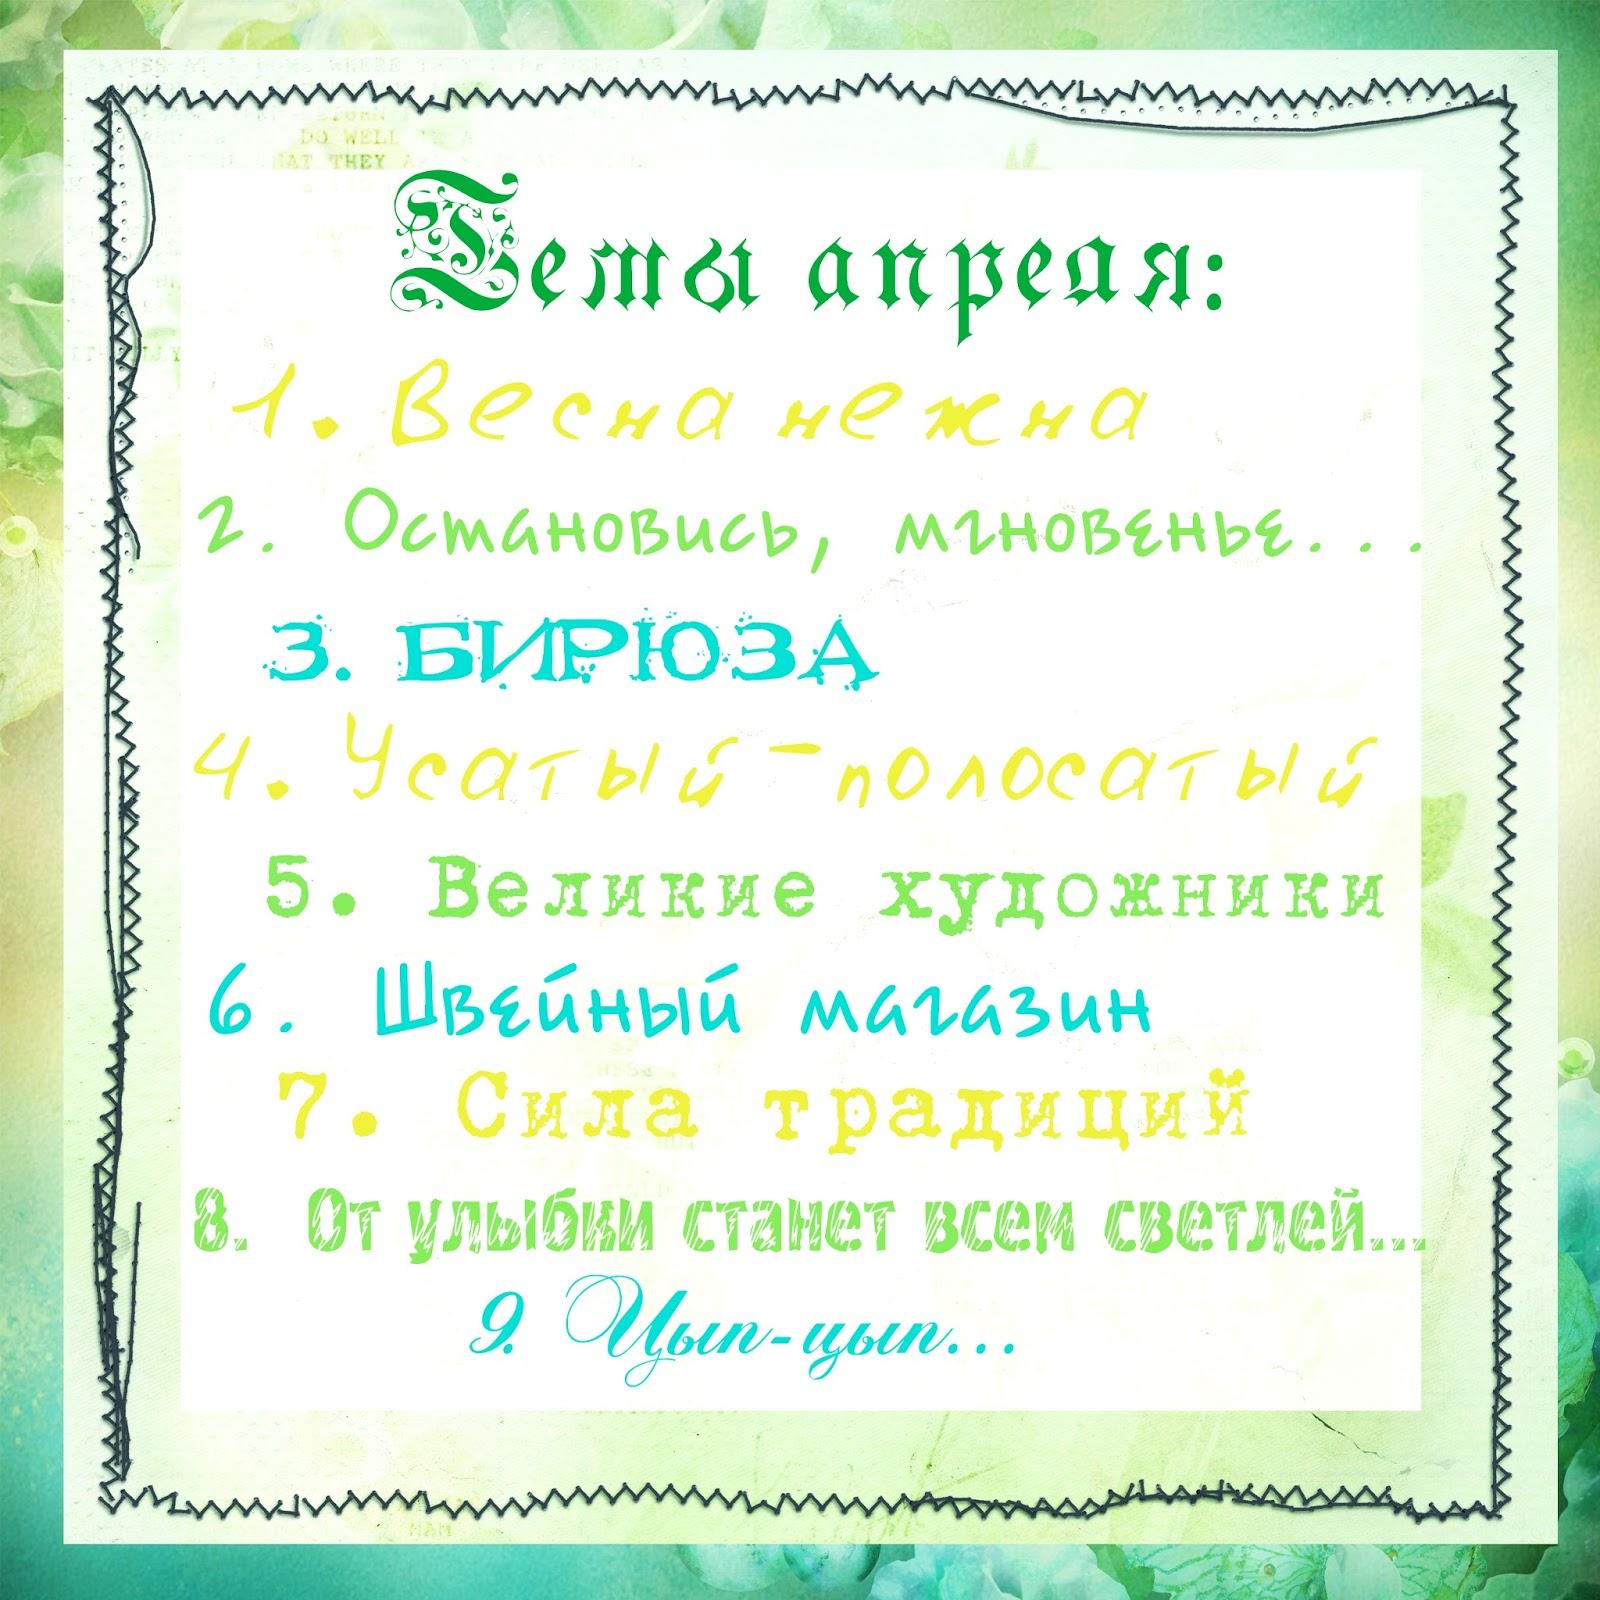 http://swesol.blogspot.ru/2015/03/gorjachijmesjacsoskrapimnaradost30.html?showComment=1427782241558#c4730372390297613143